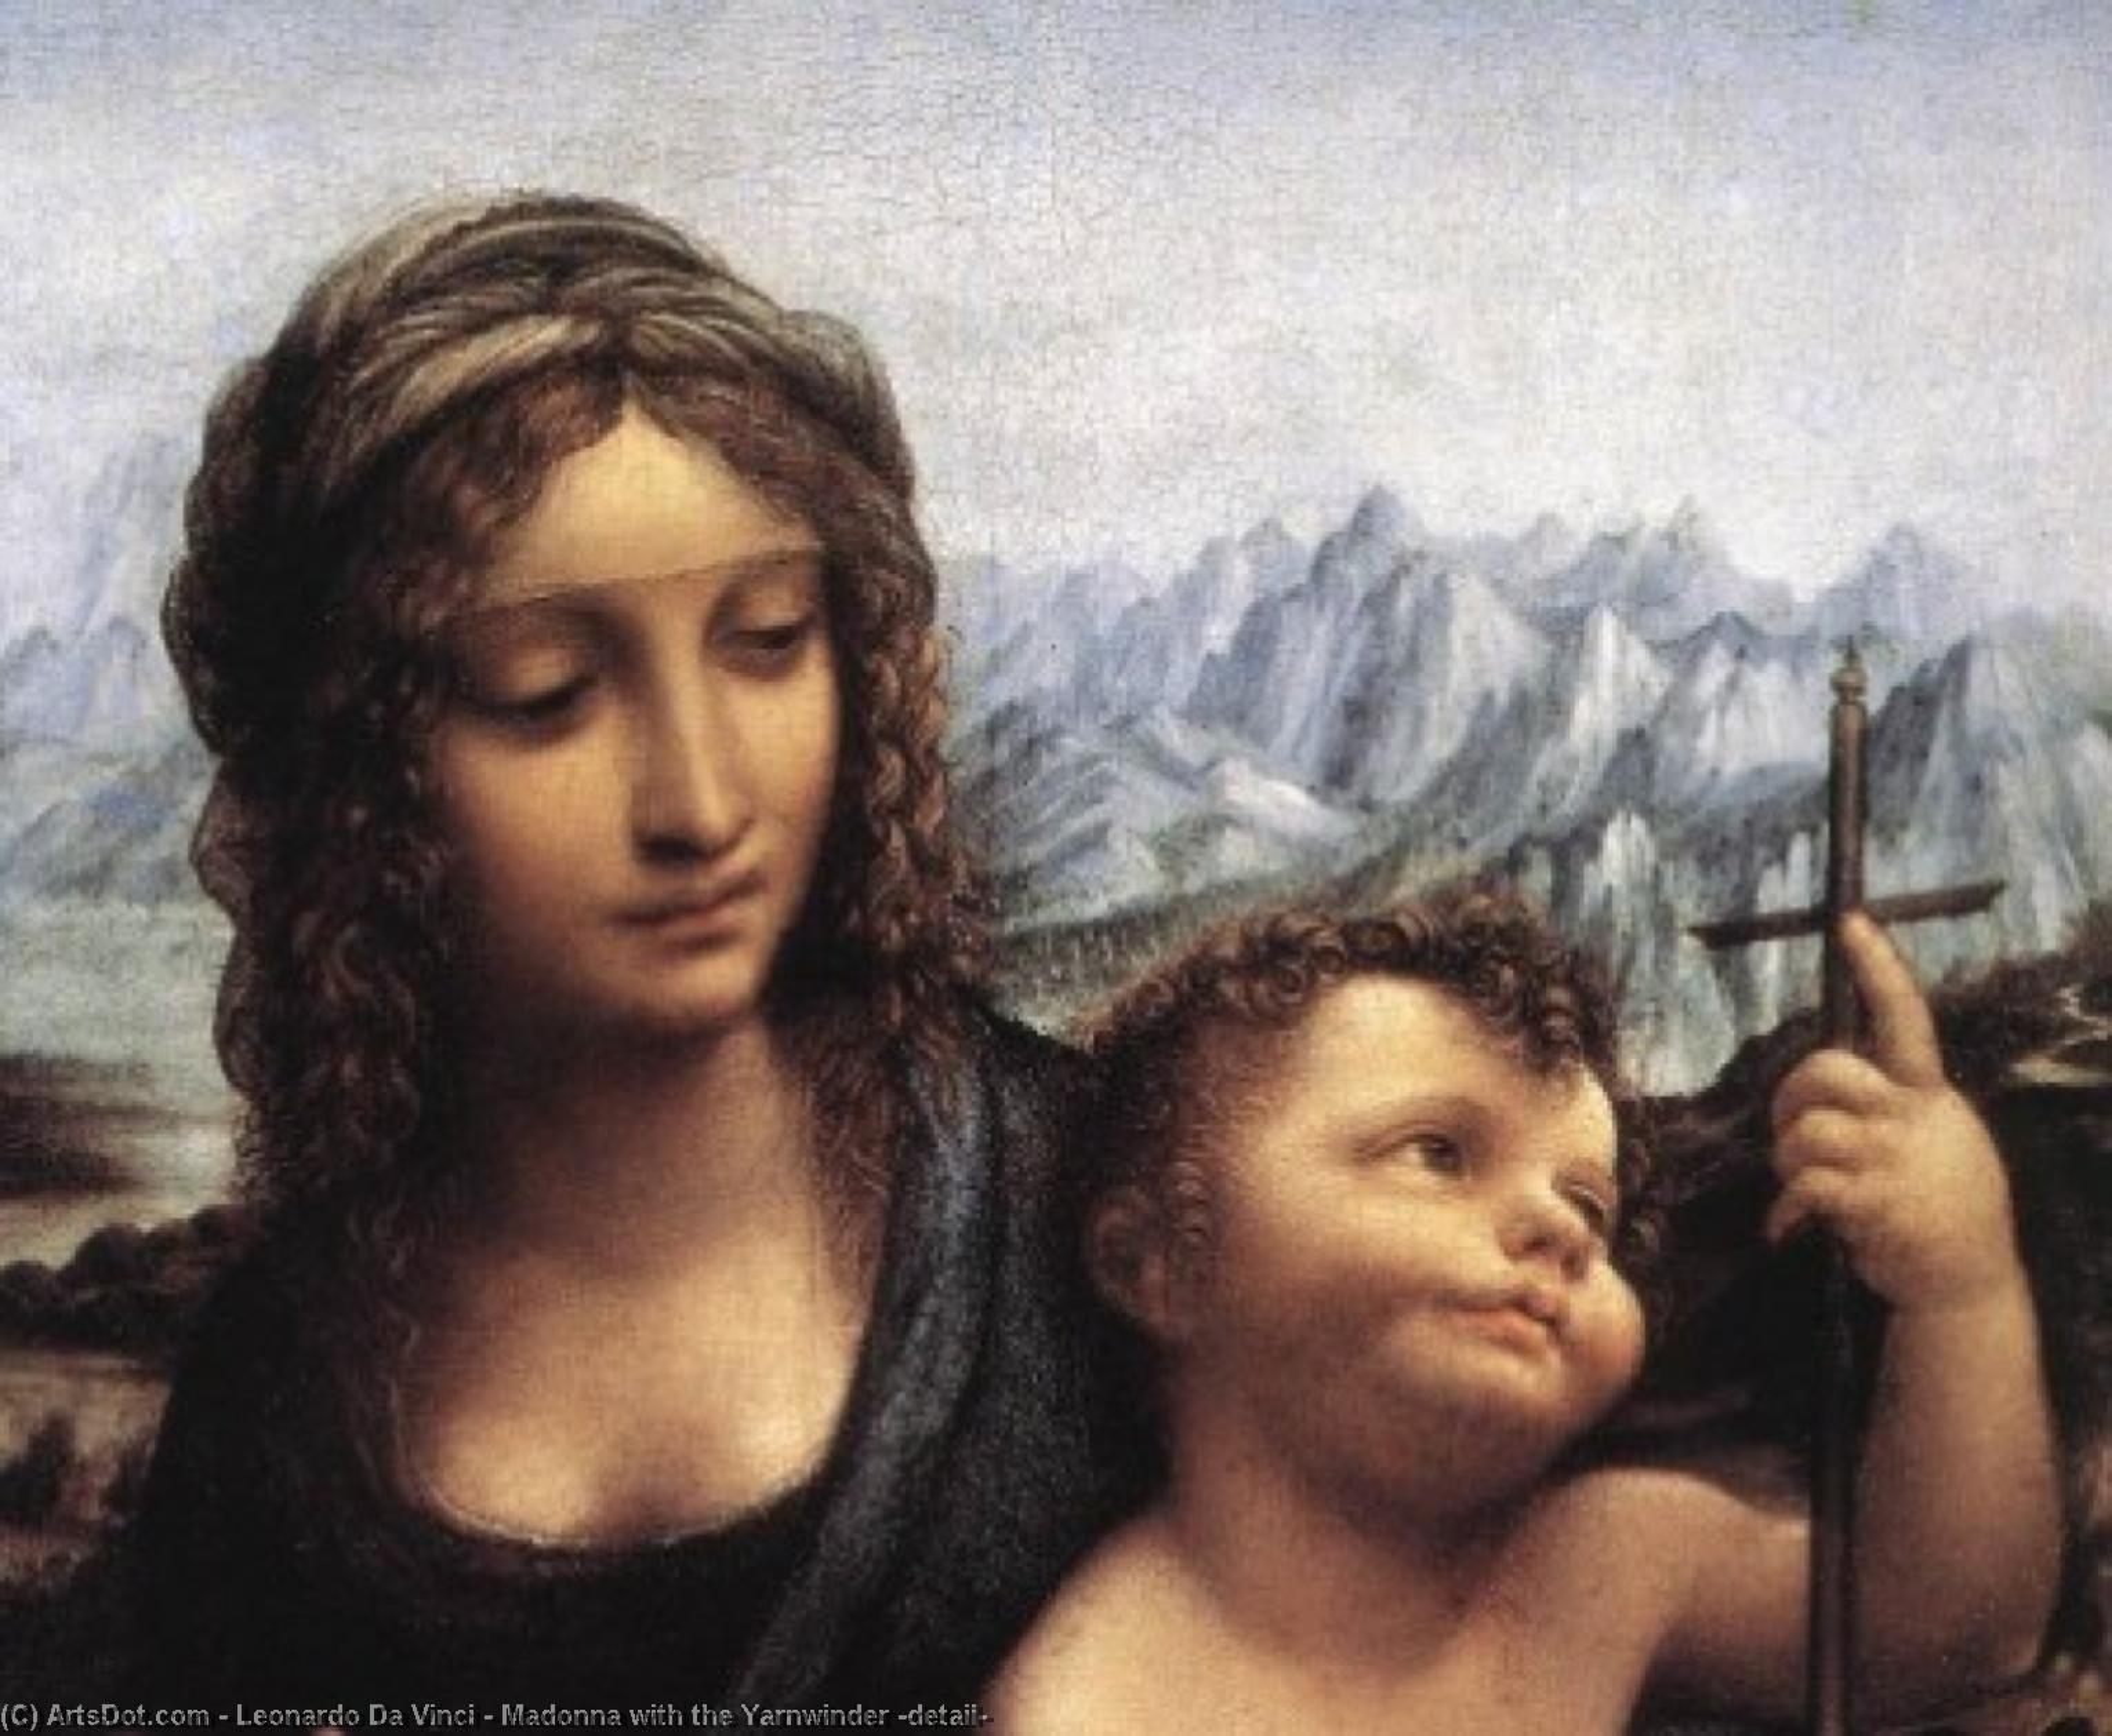 Wikioo.org - The Encyclopedia of Fine Arts - Painting, Artwork by Leonardo Da Vinci - Madonna with the Yarnwinder (detail)